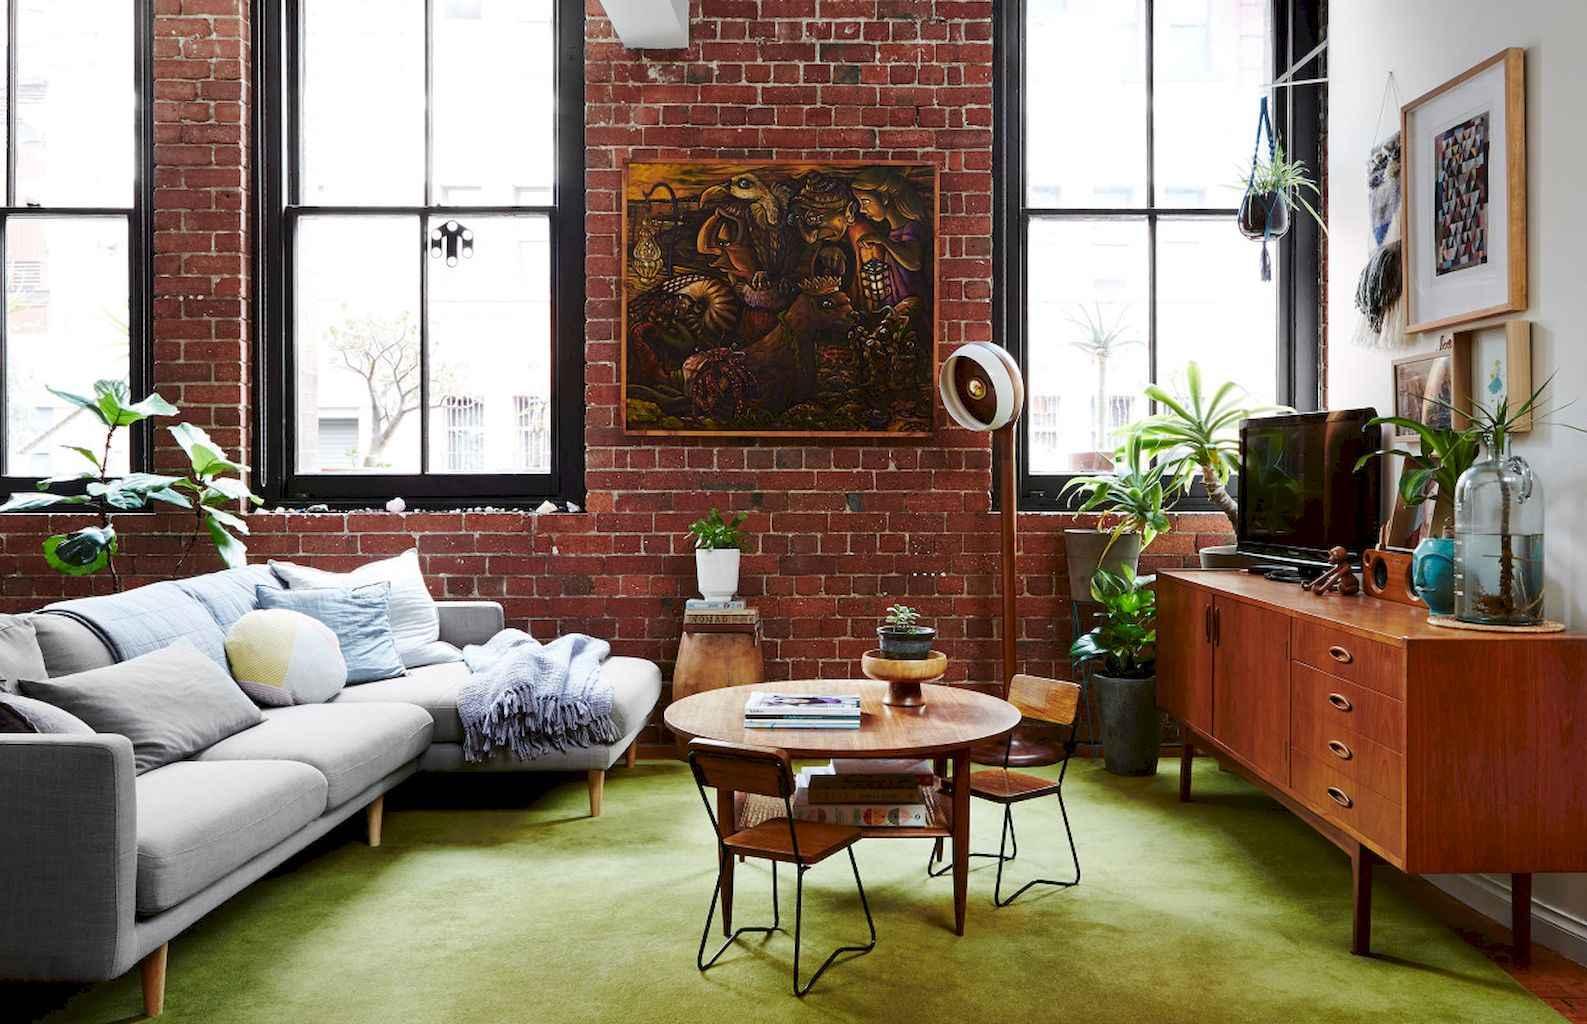 Simple clean vintage living room decorating ideas (6)